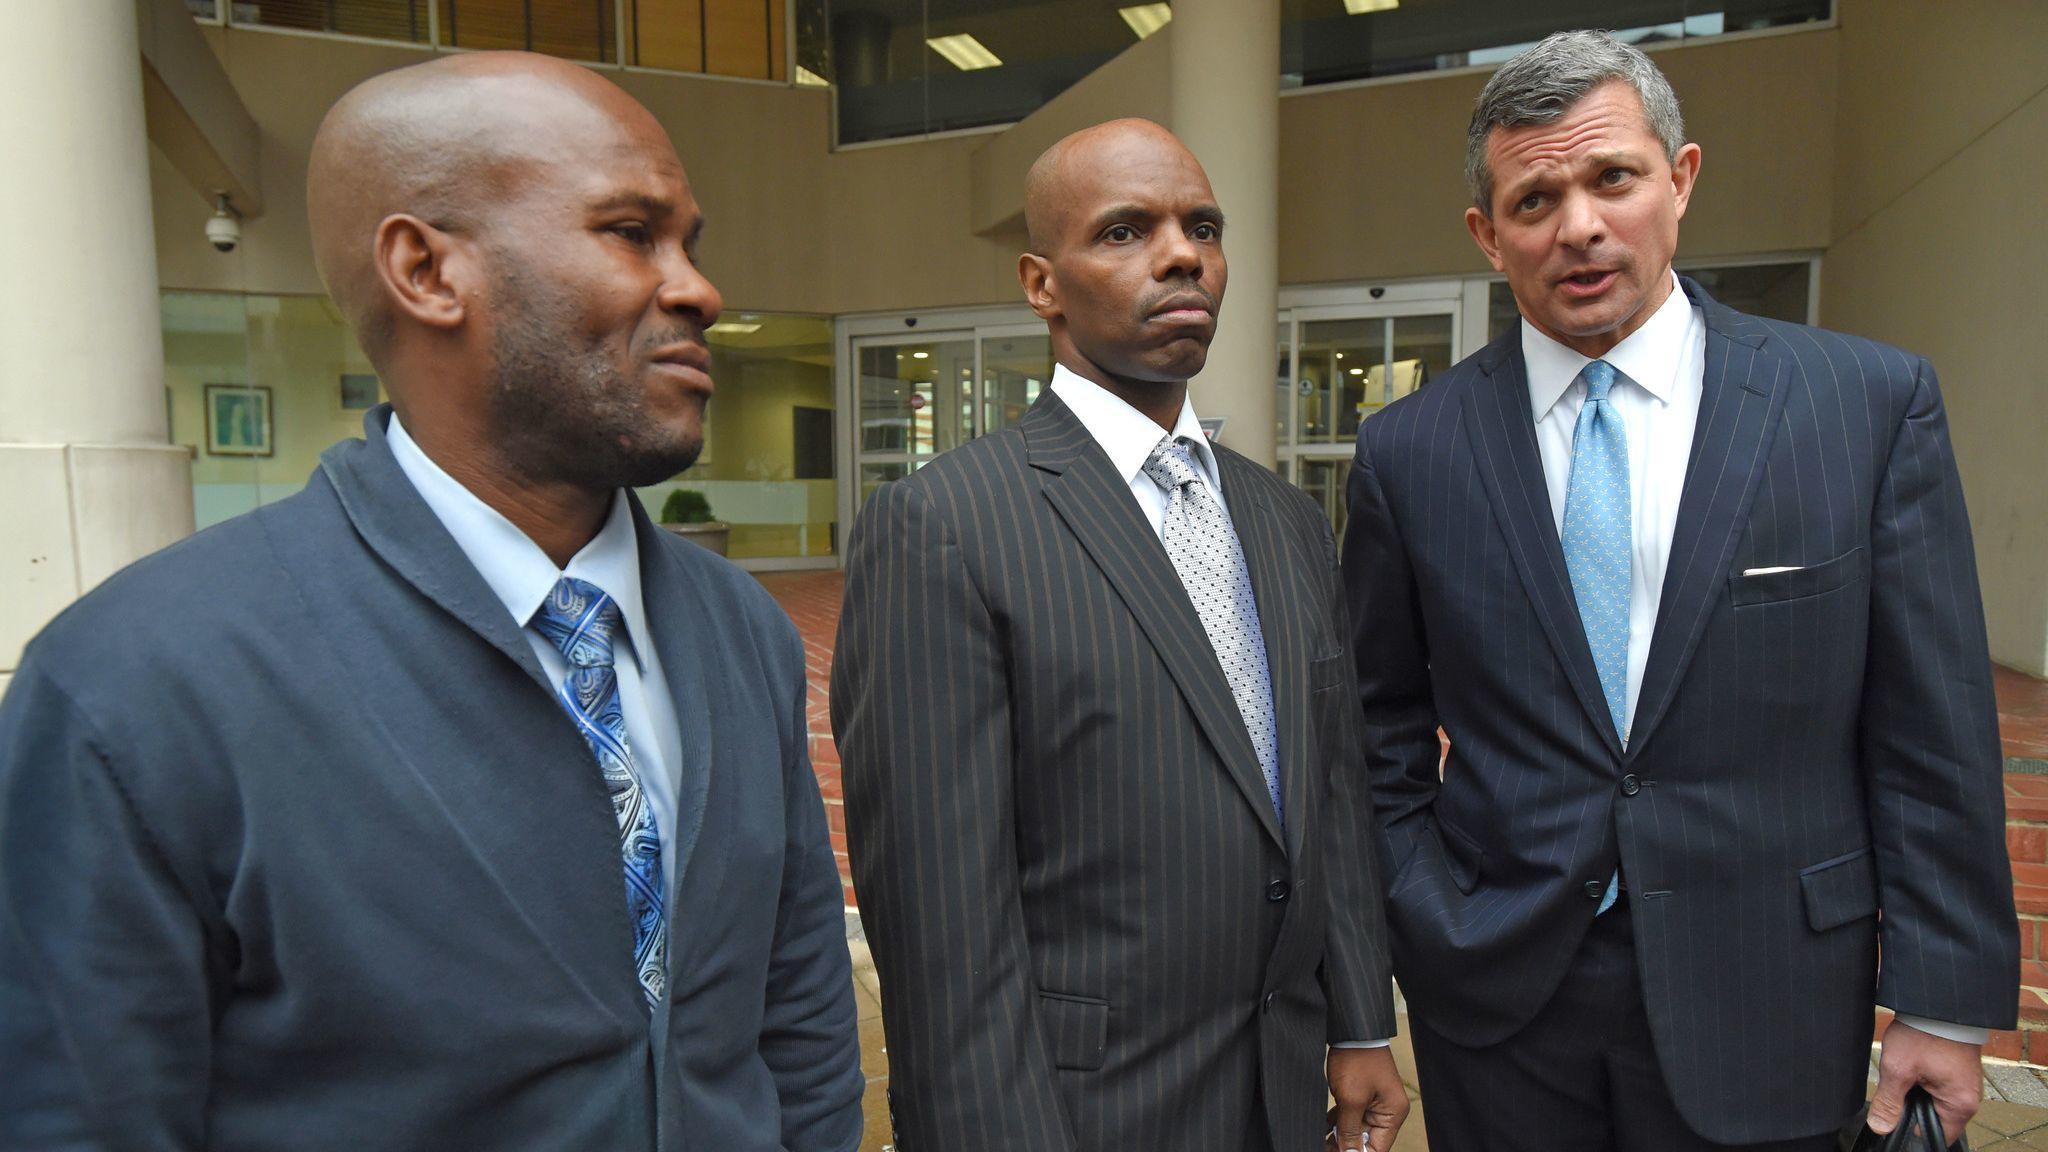 Manslaughter conviction overturned for man arrested by corrupt Baltimore Gun Trace Task Force officer